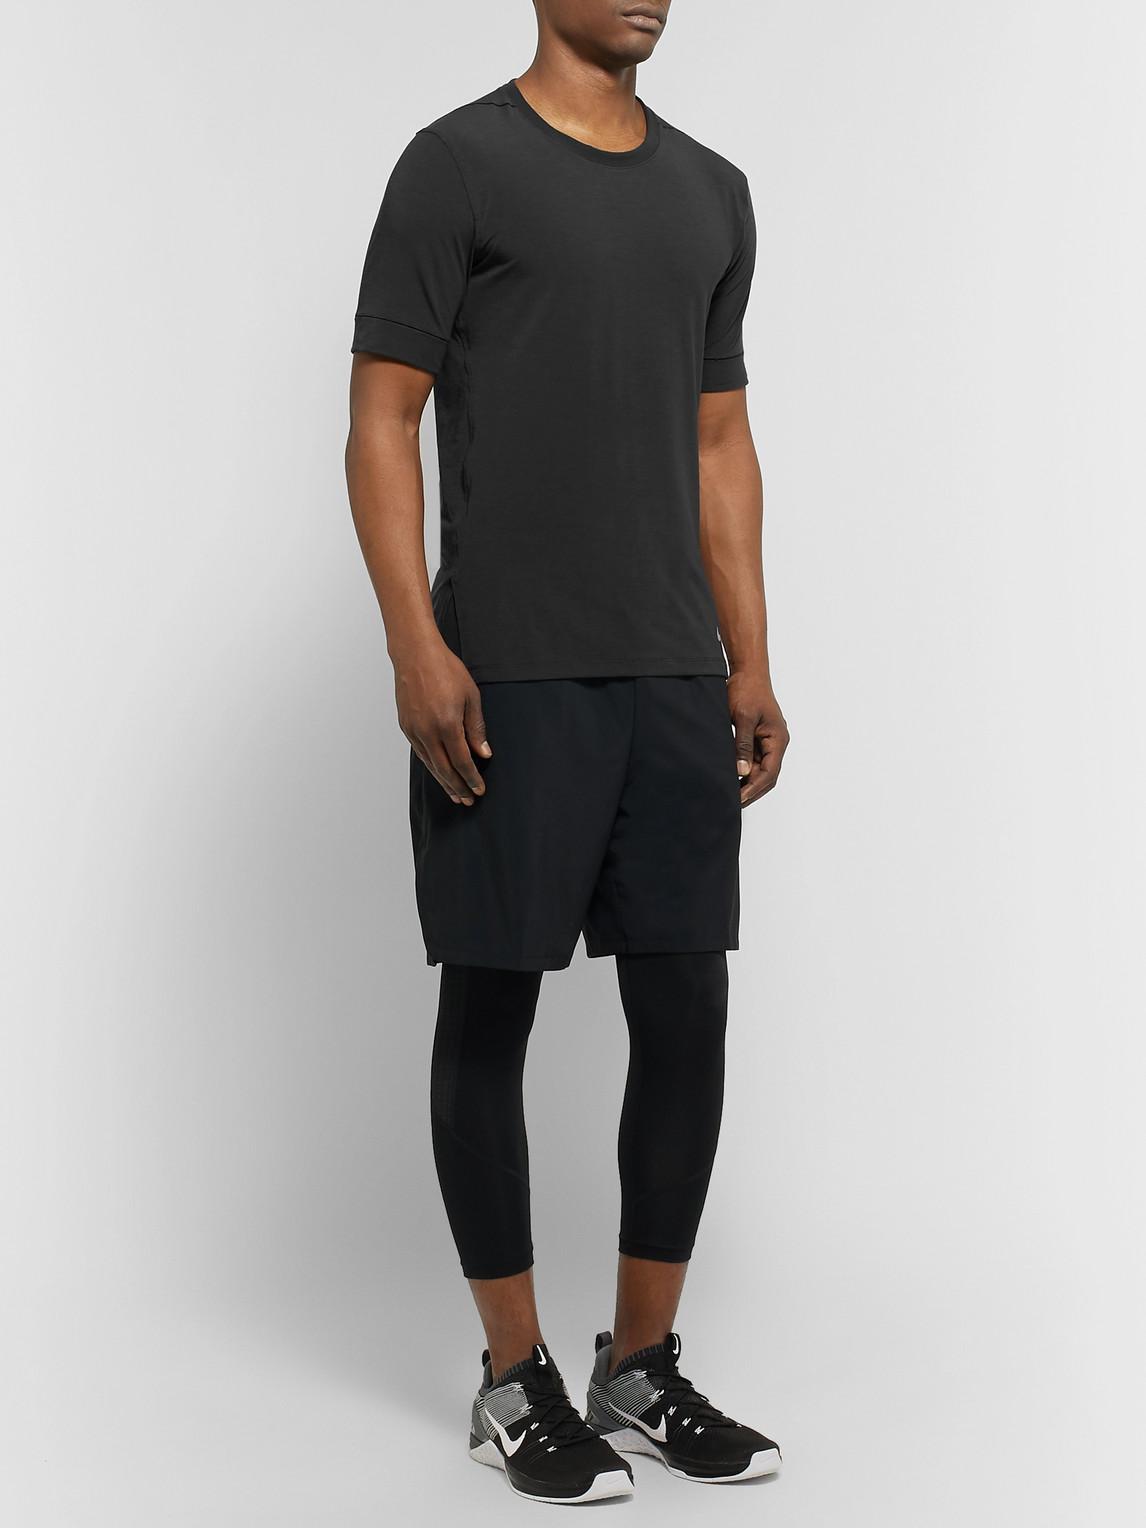 Nike Tops TRANSCEND DRI